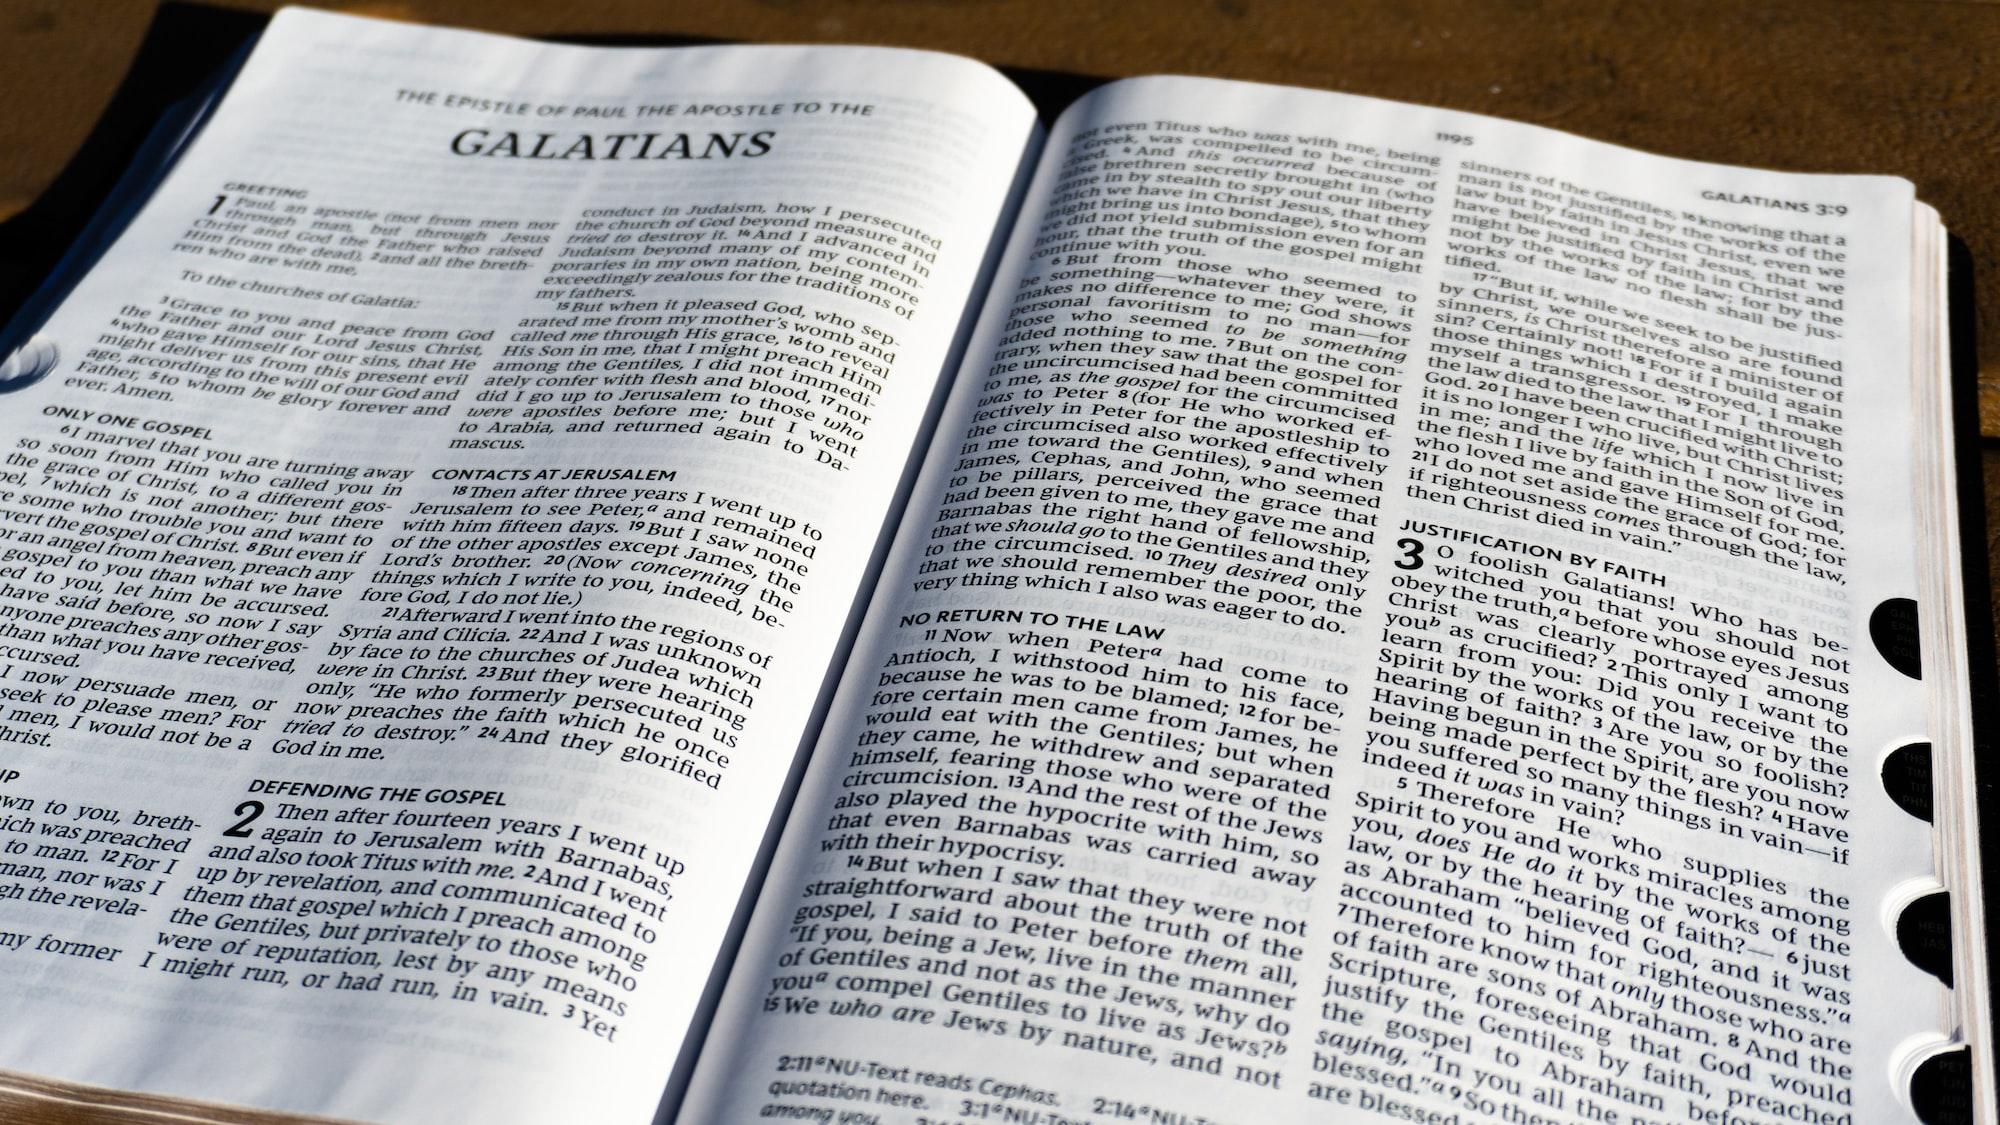 [16:9] NKJV Bible open to the Book of Galatians, closeup